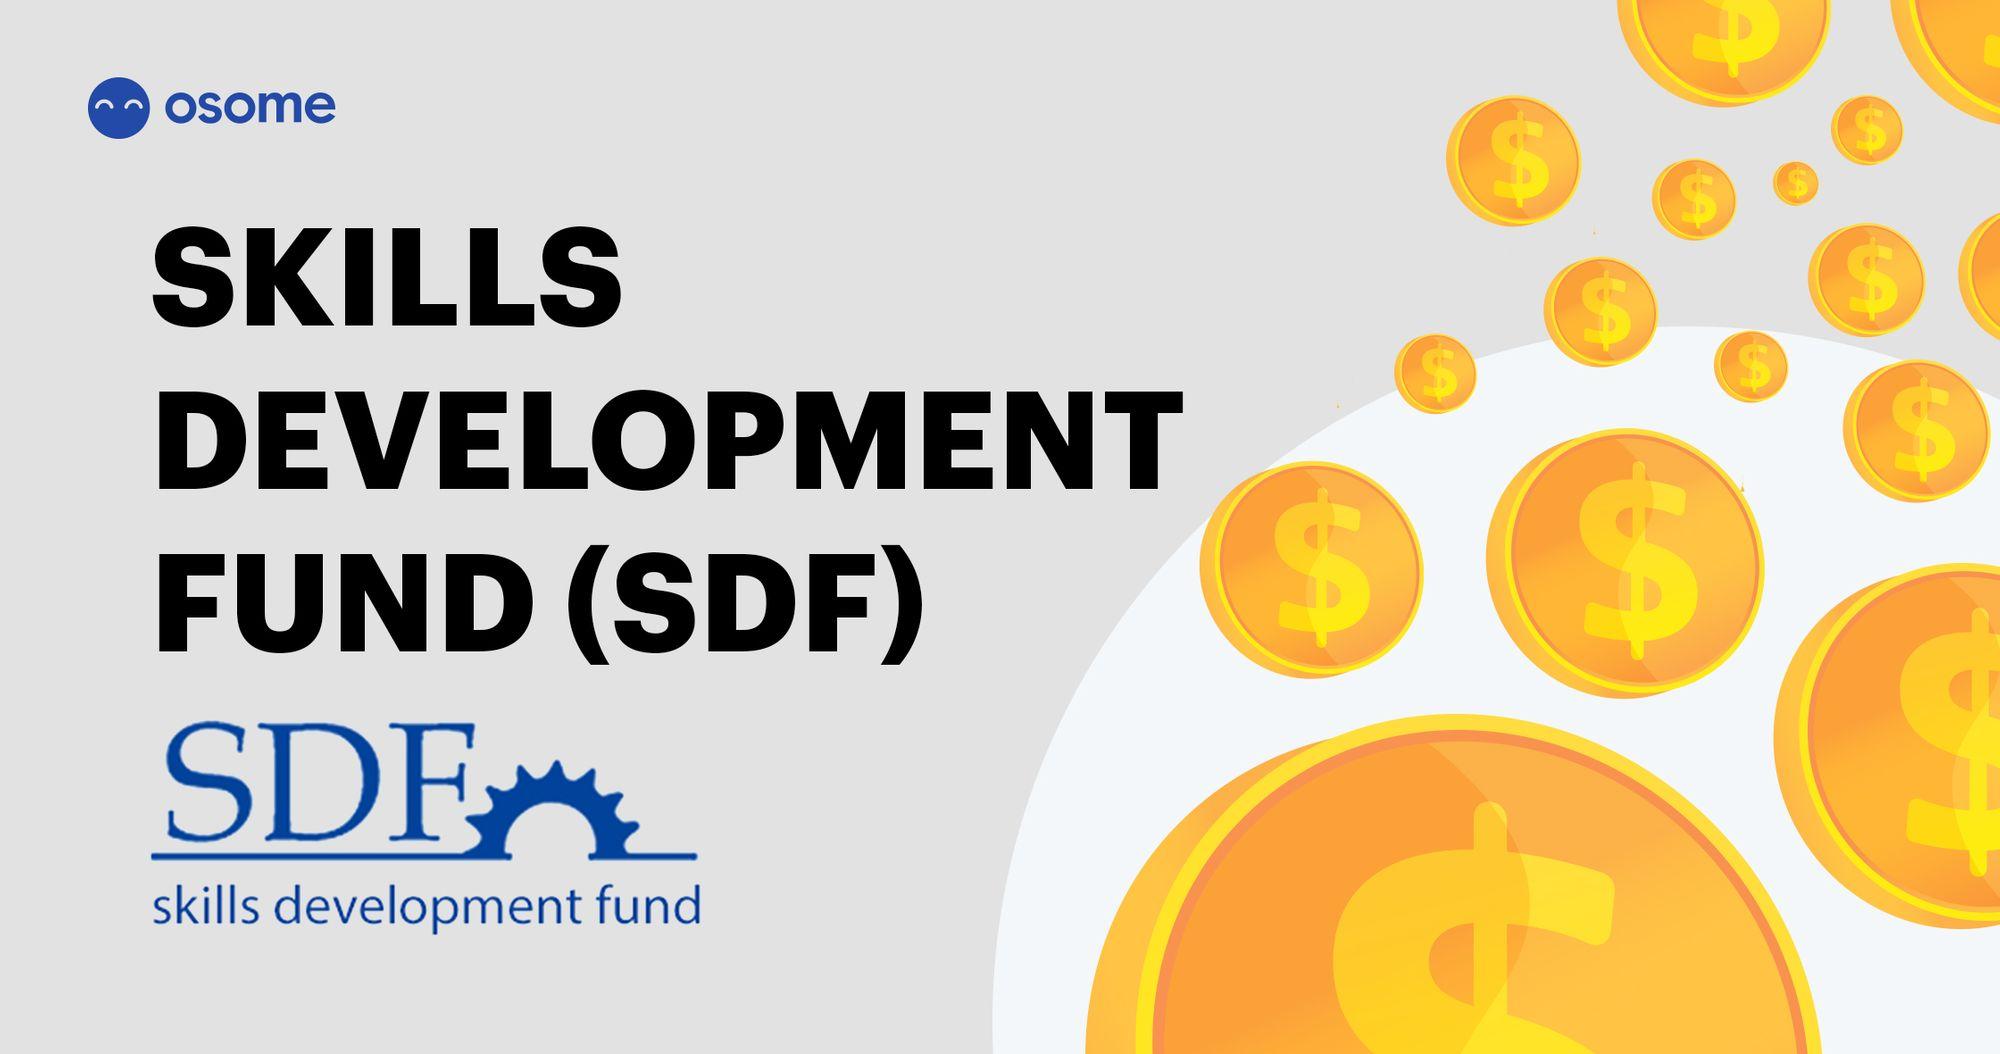 Skills Development Fund (SDF)